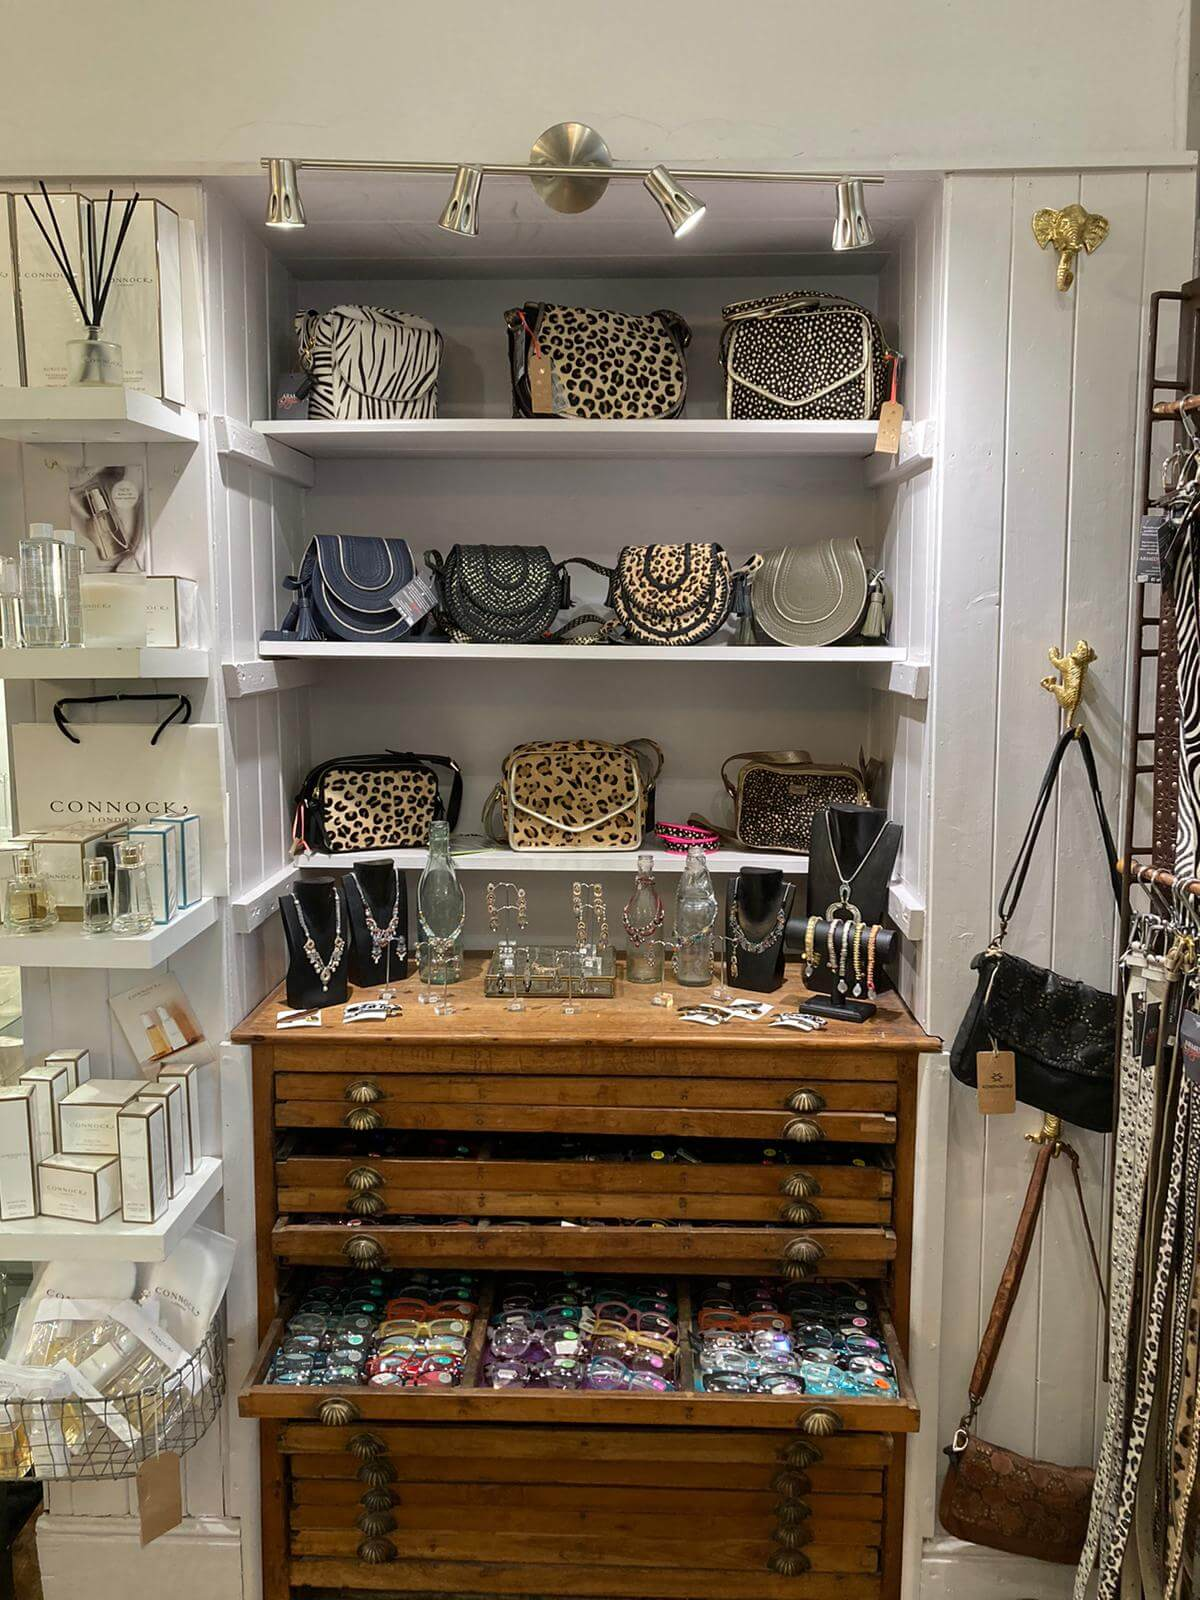 Handbags, belts, Stroud and Nilsworth shops